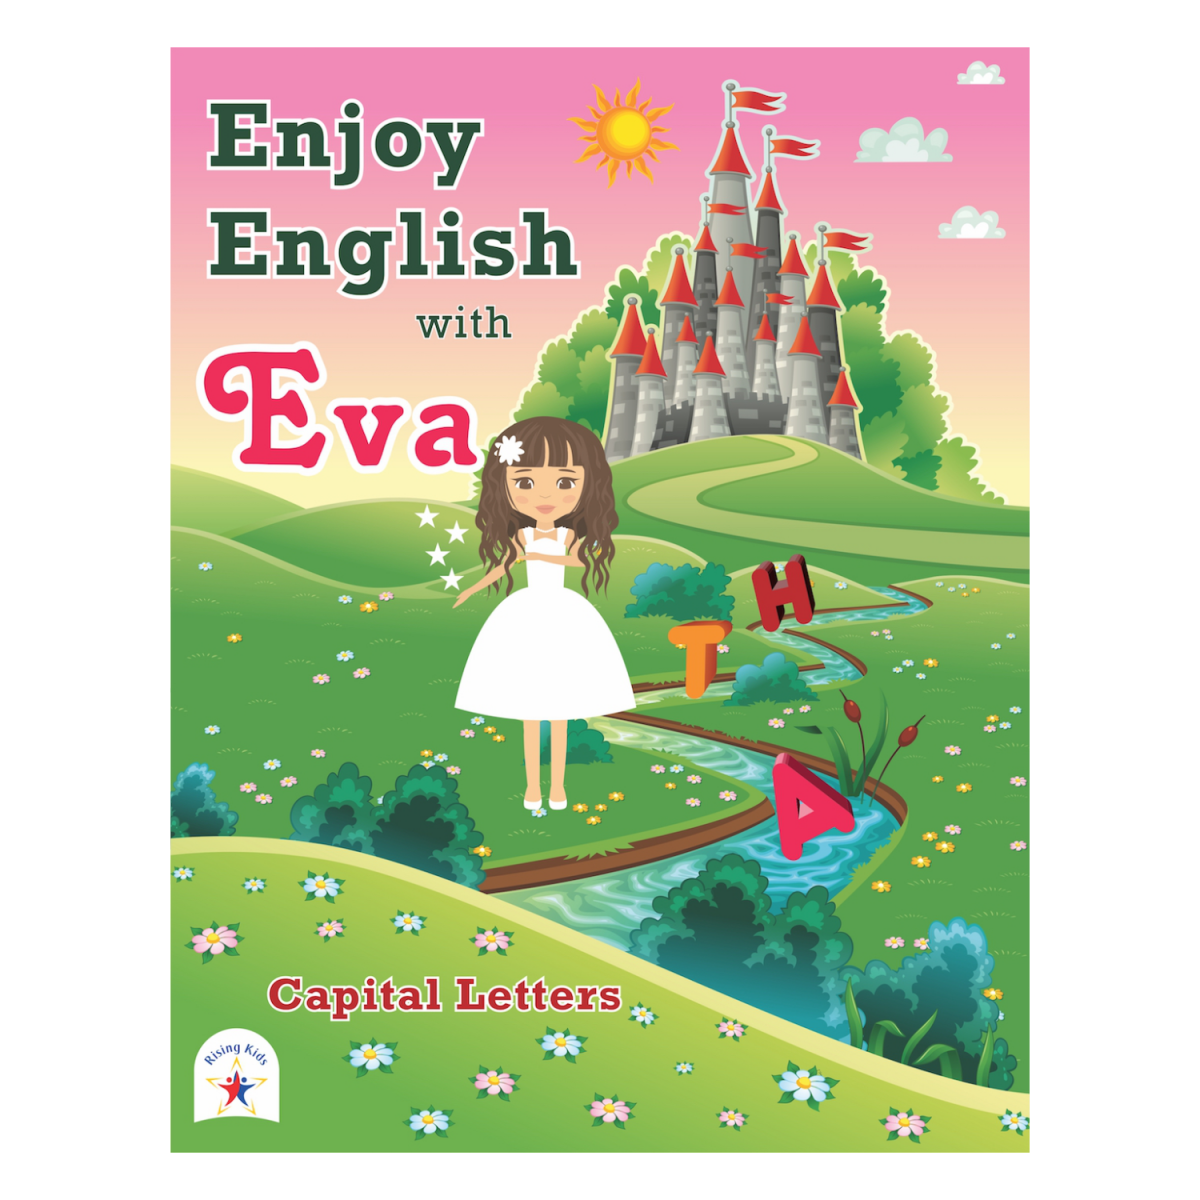 Enjoy English with EVA - Rising Kids (Capital letters)